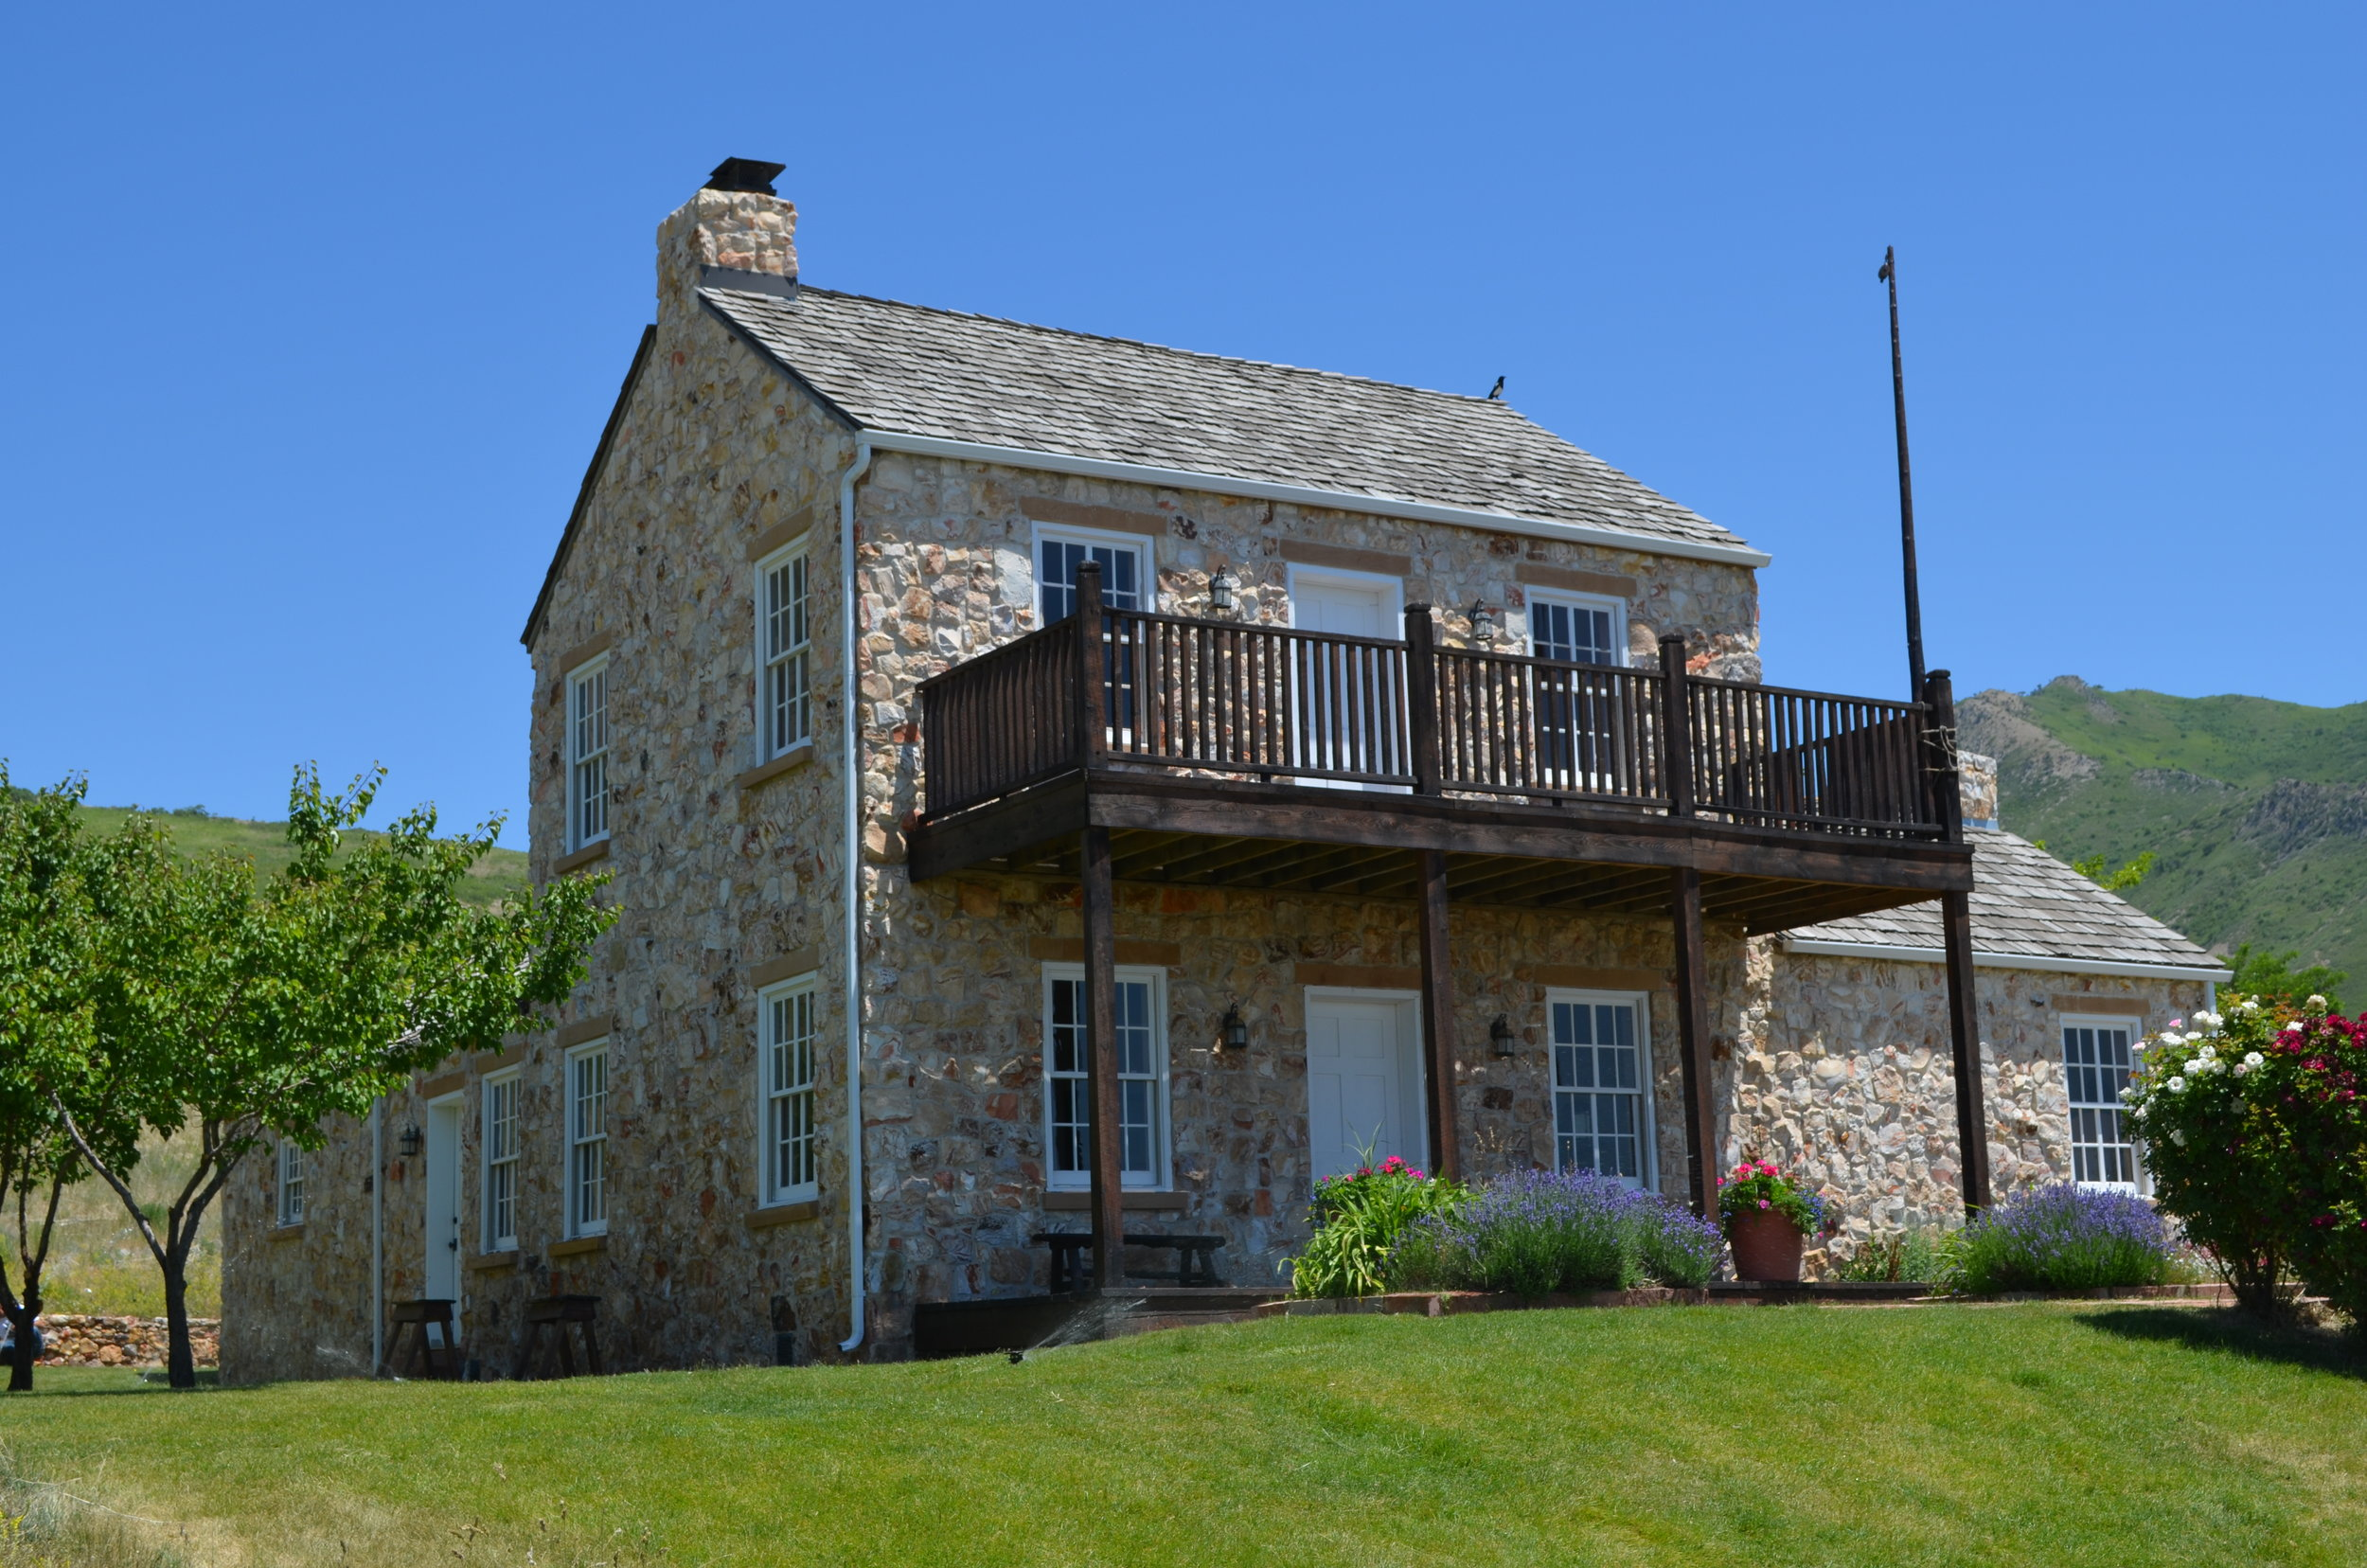 William Atkin Home